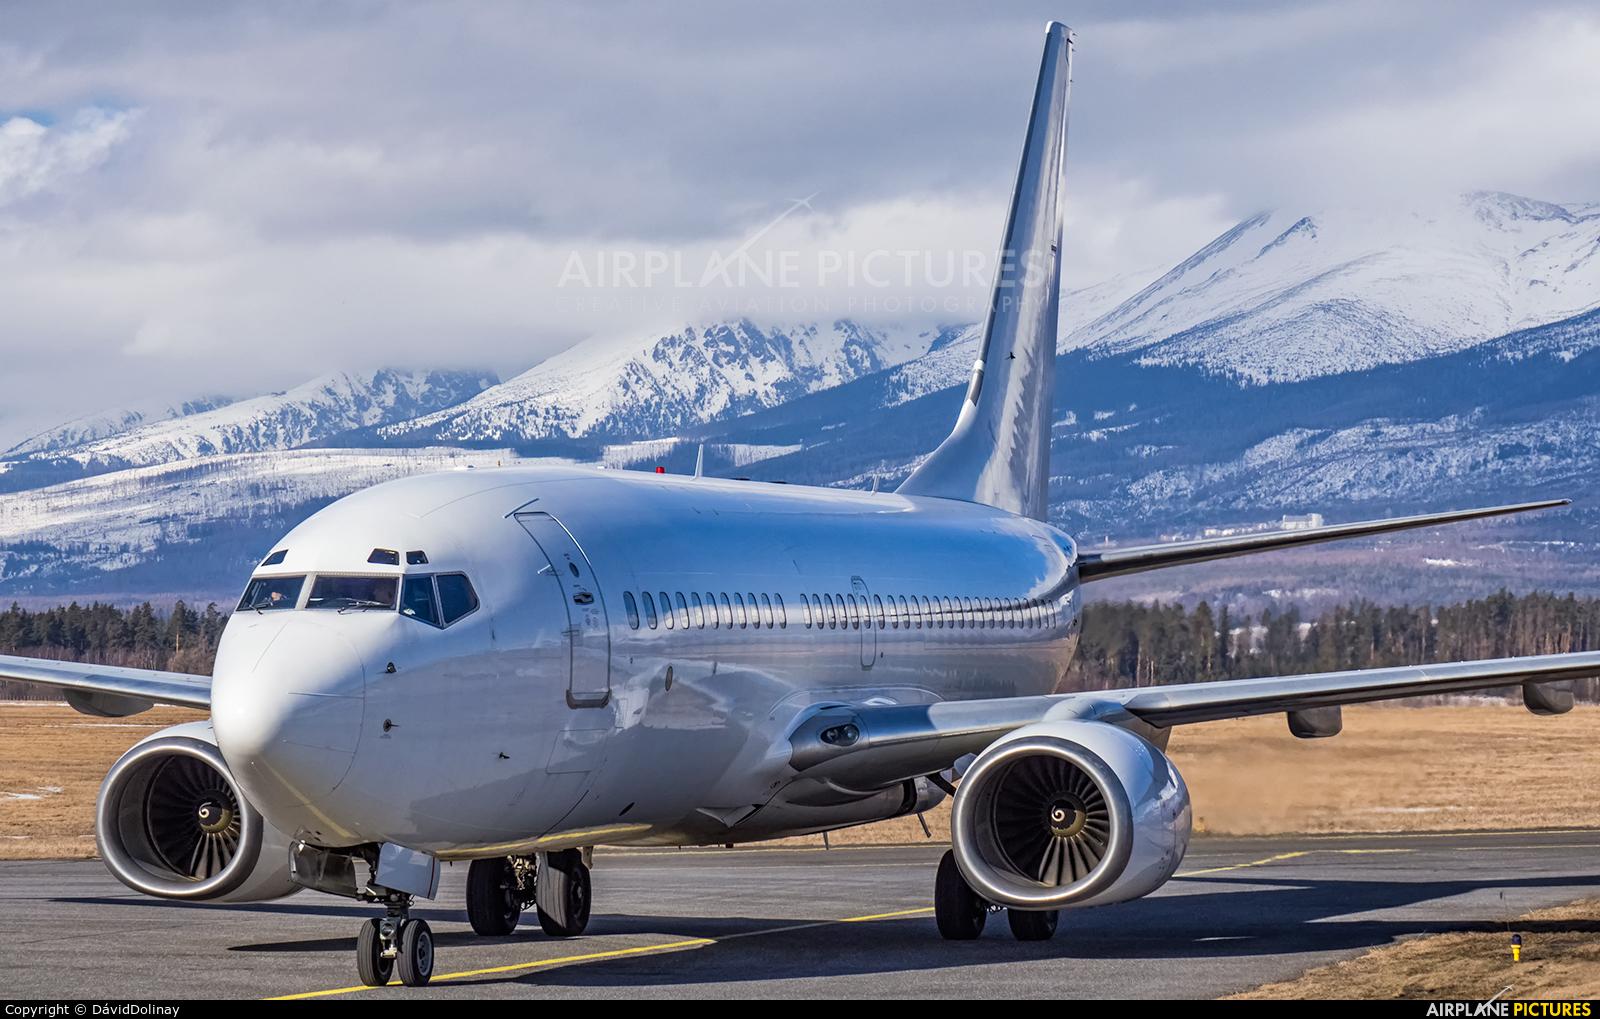 SkyUp Airlines UR-SQD aircraft at Poprad - Tatry